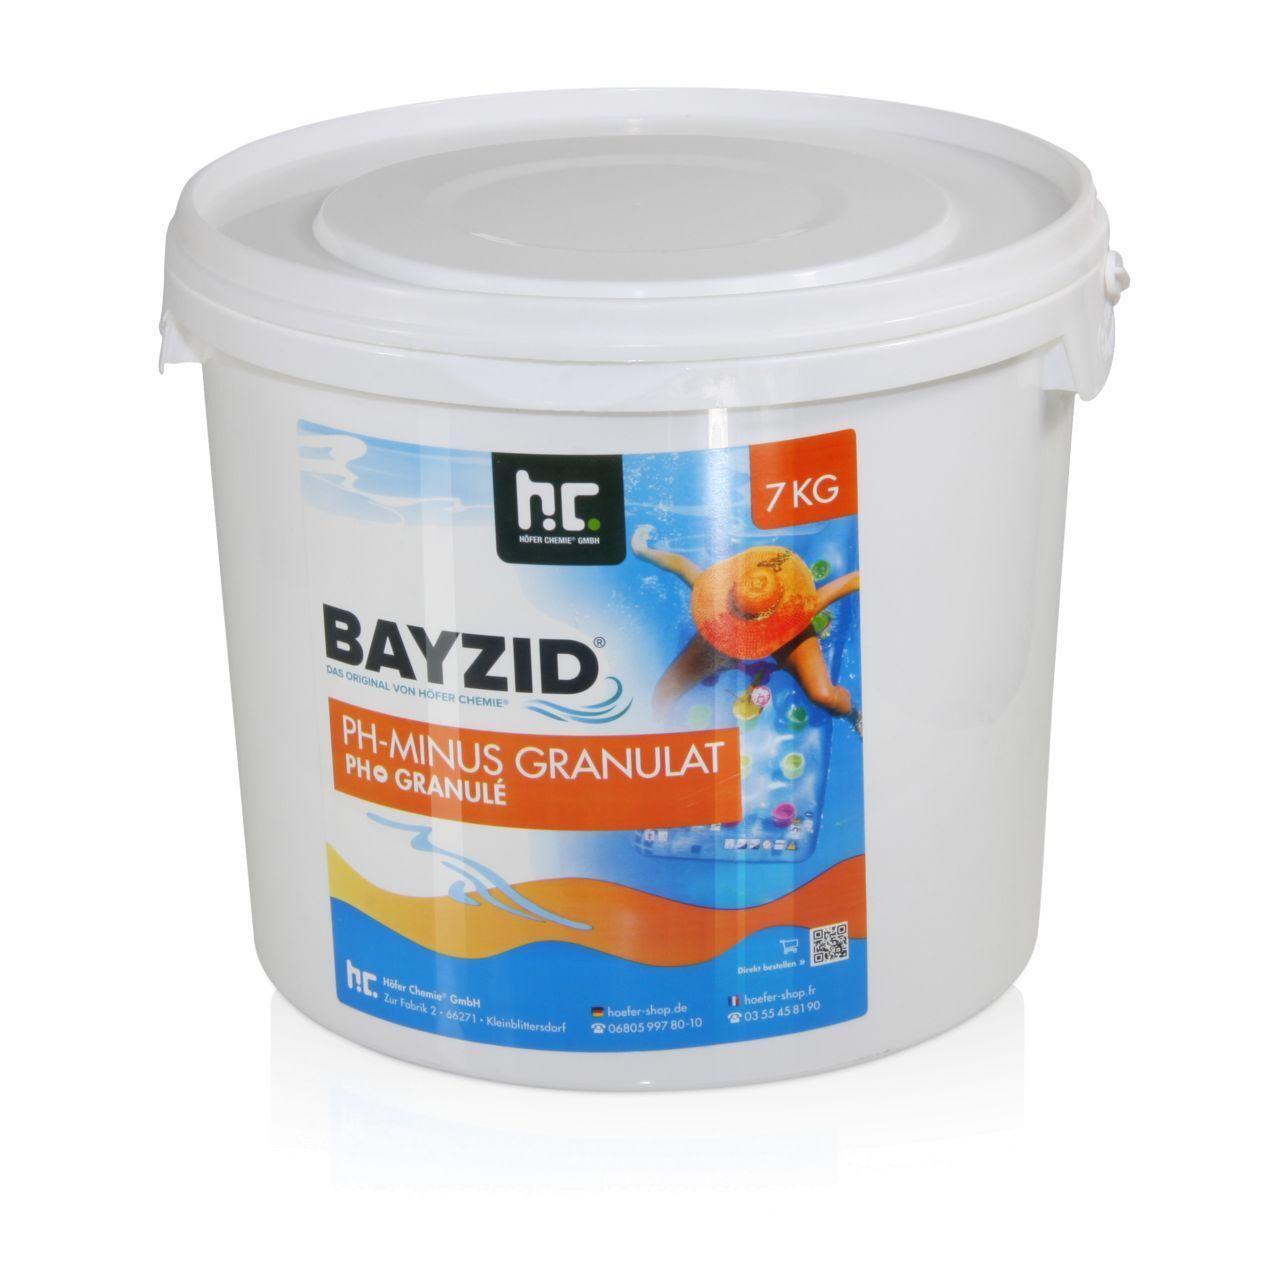 BAYZID 7 kg Bayzid® pH moins granulé (1 x 7 kg)